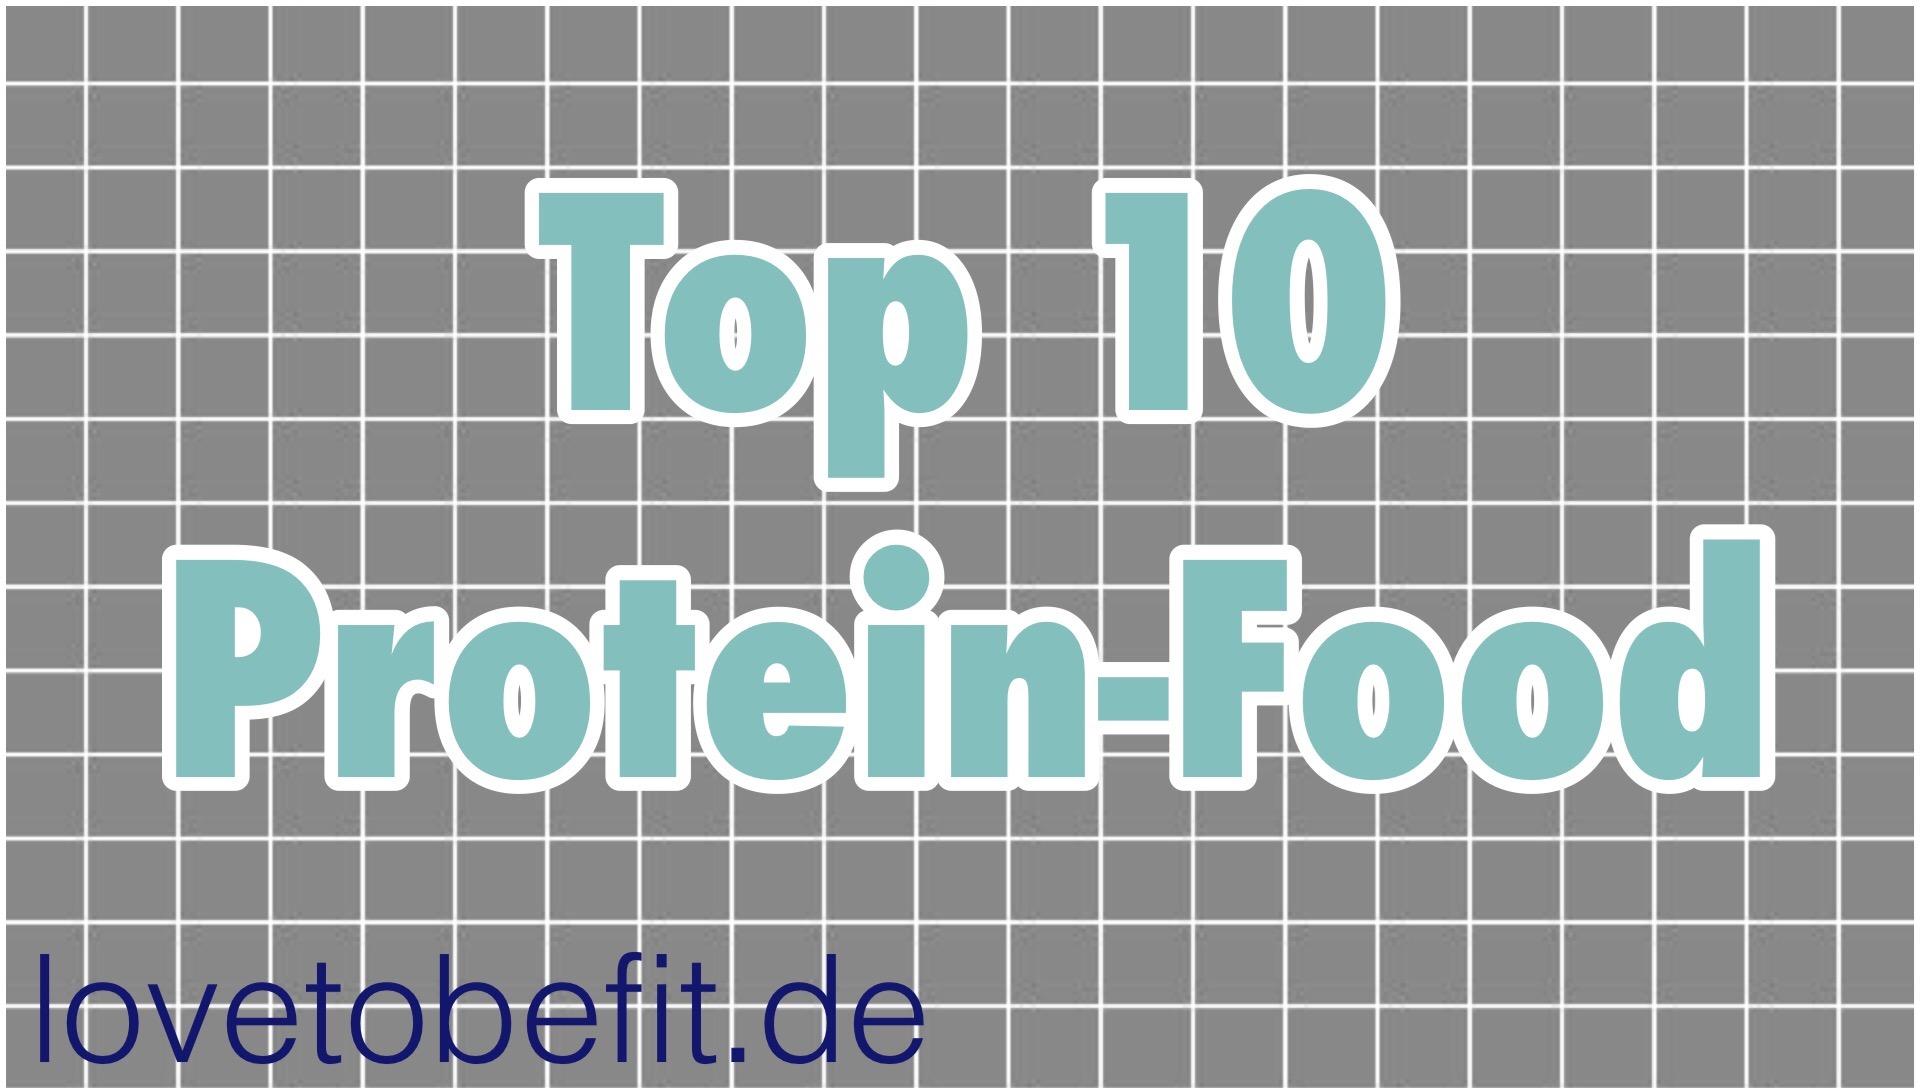 Top 10 Eiweiß-Lebensmittel!